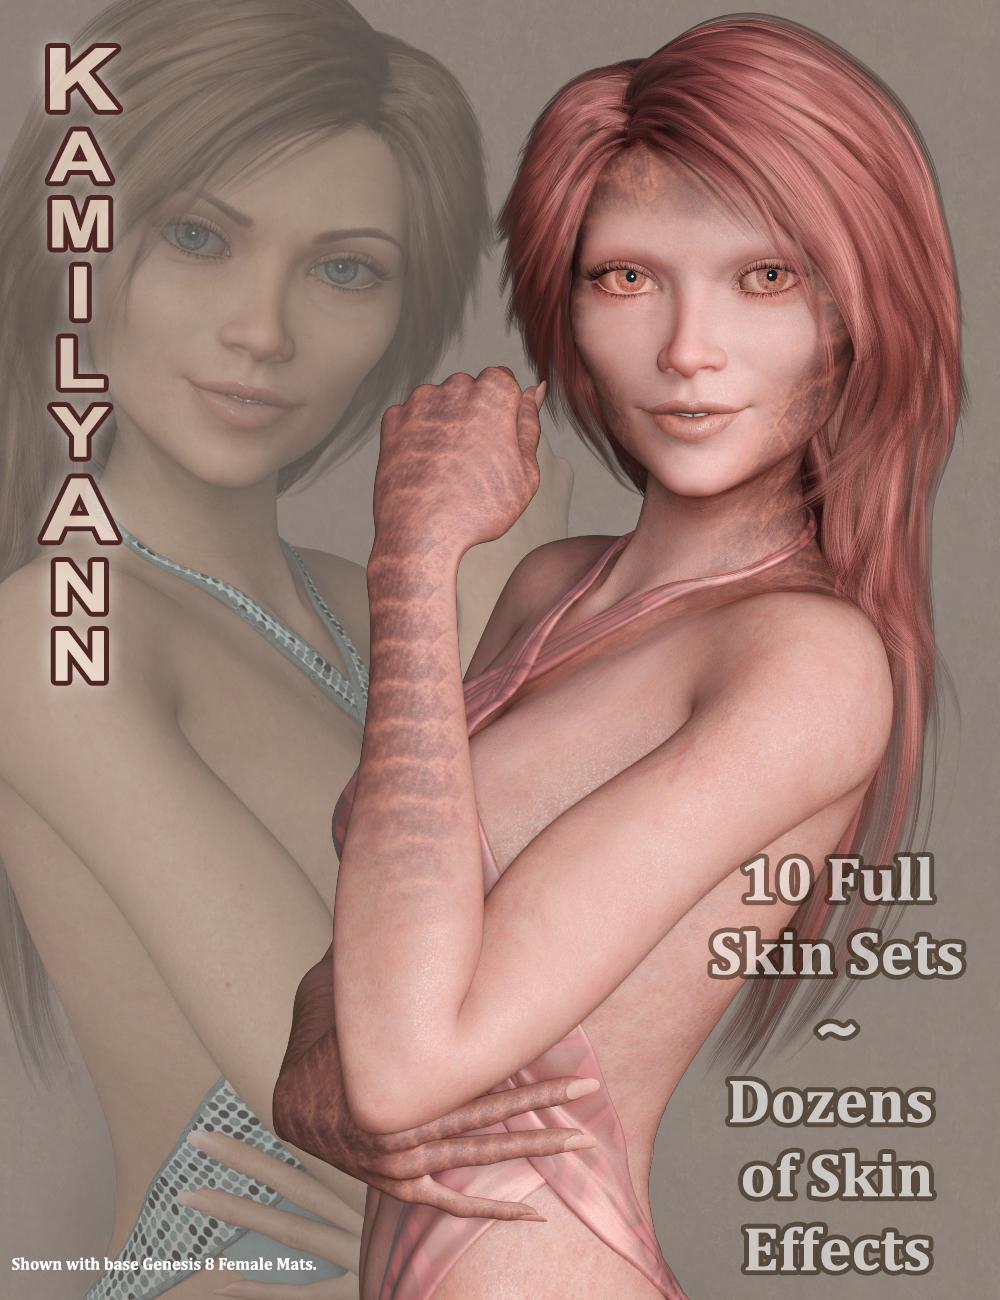 KamilyAnn for Zelara 8 by: 3Diva, 3D Models by Daz 3D